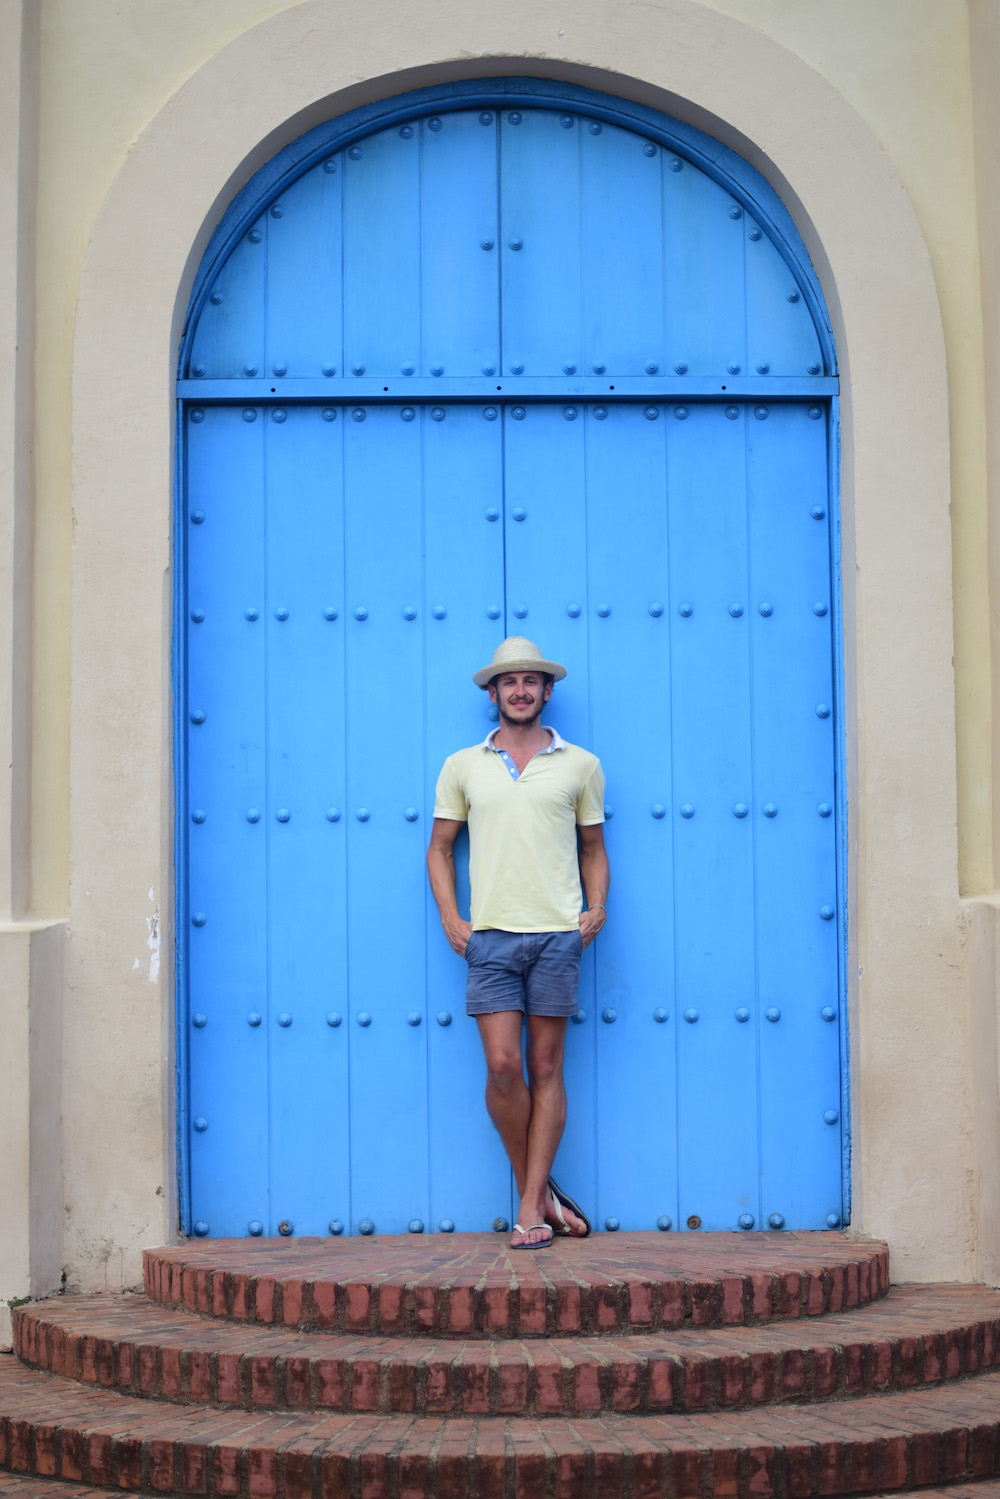 Robert Schrader Cuba travel pictures